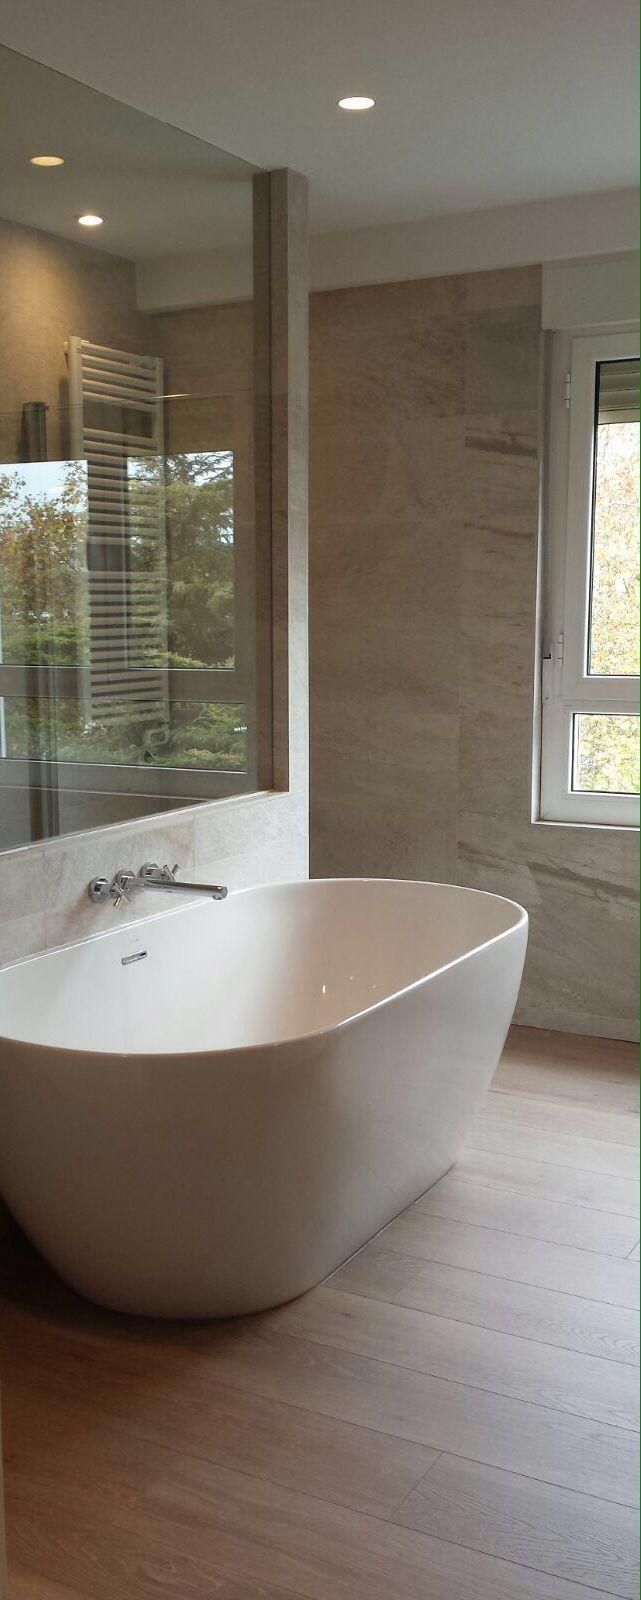 Instalación en un piso de Vitoria, realizada por Acqua Terra, Bañera modelo Trento de Sanycces.